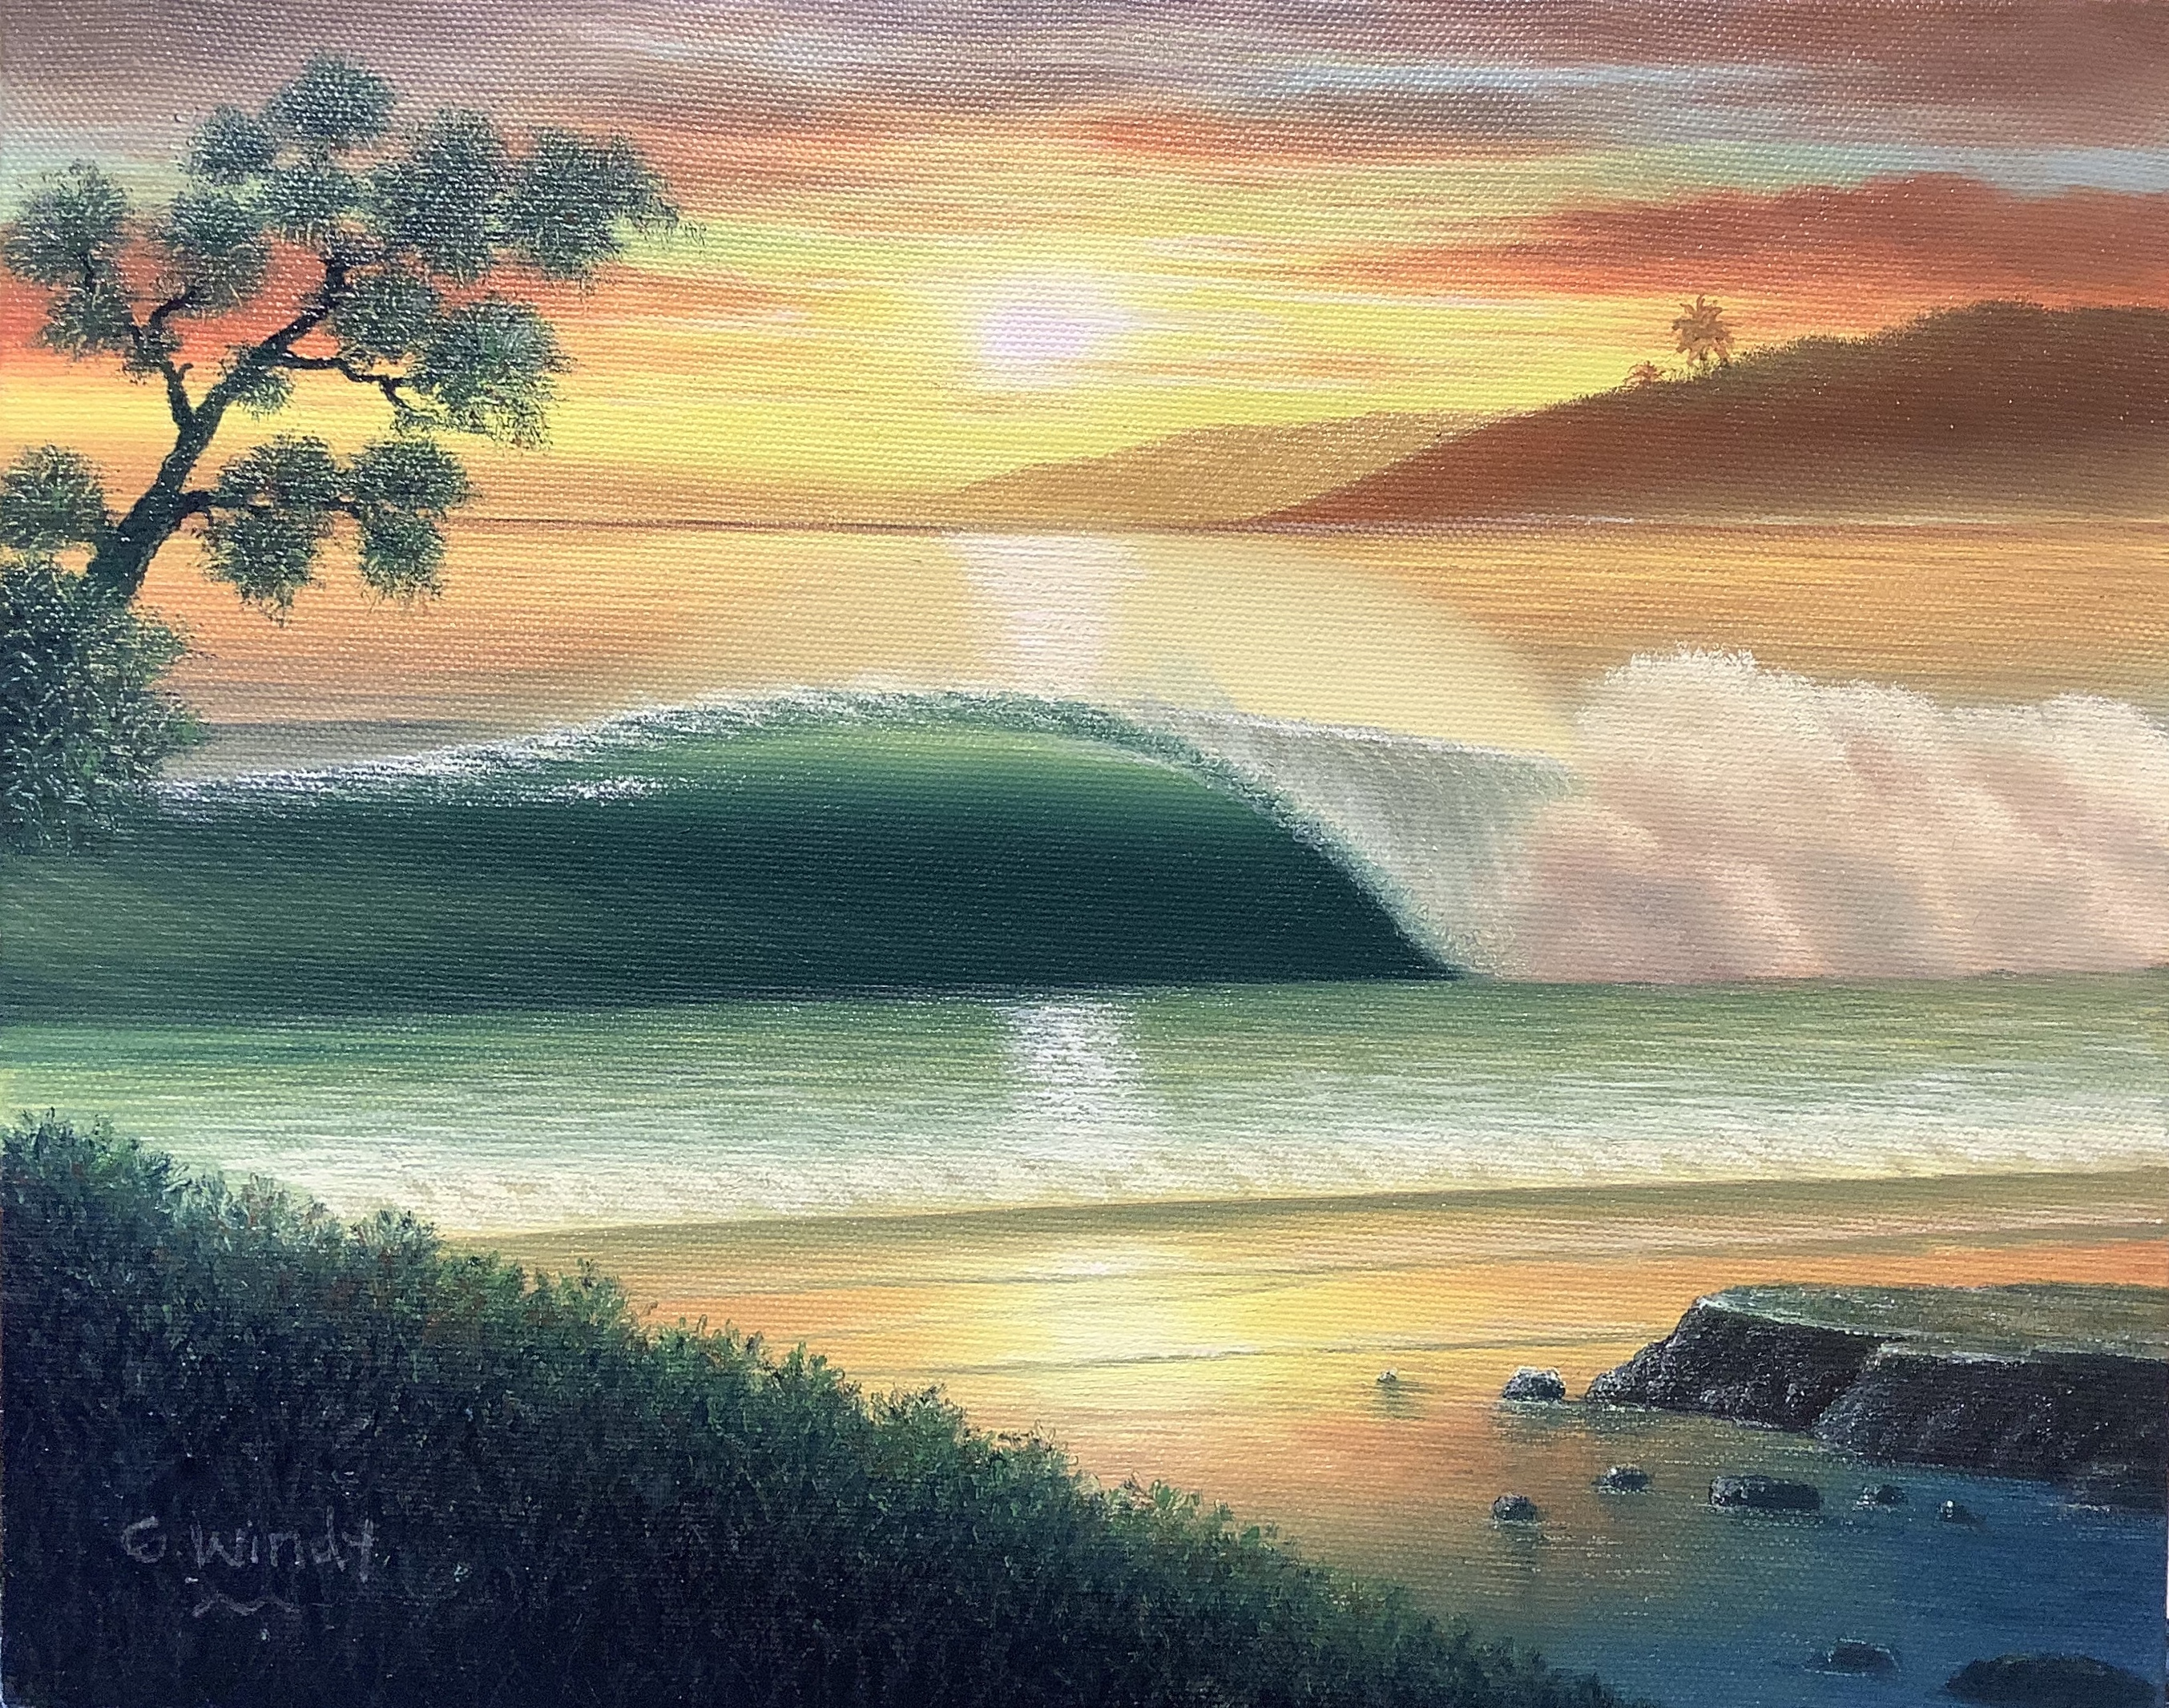 Dreamland Wave Art F3 with Pohon Matsu